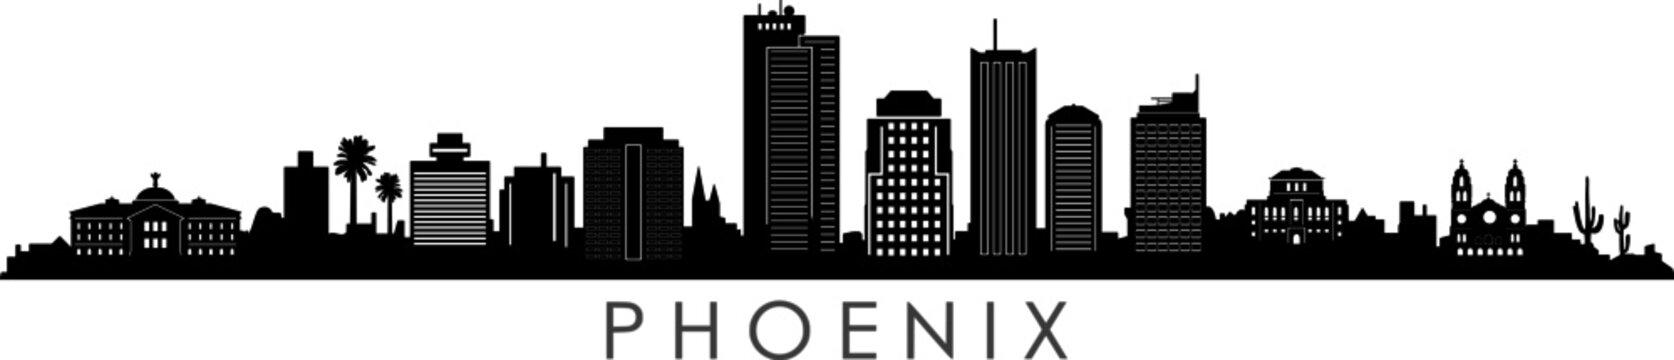 Phoenix City Arizona Skyline Silhouette Cityscape Vector